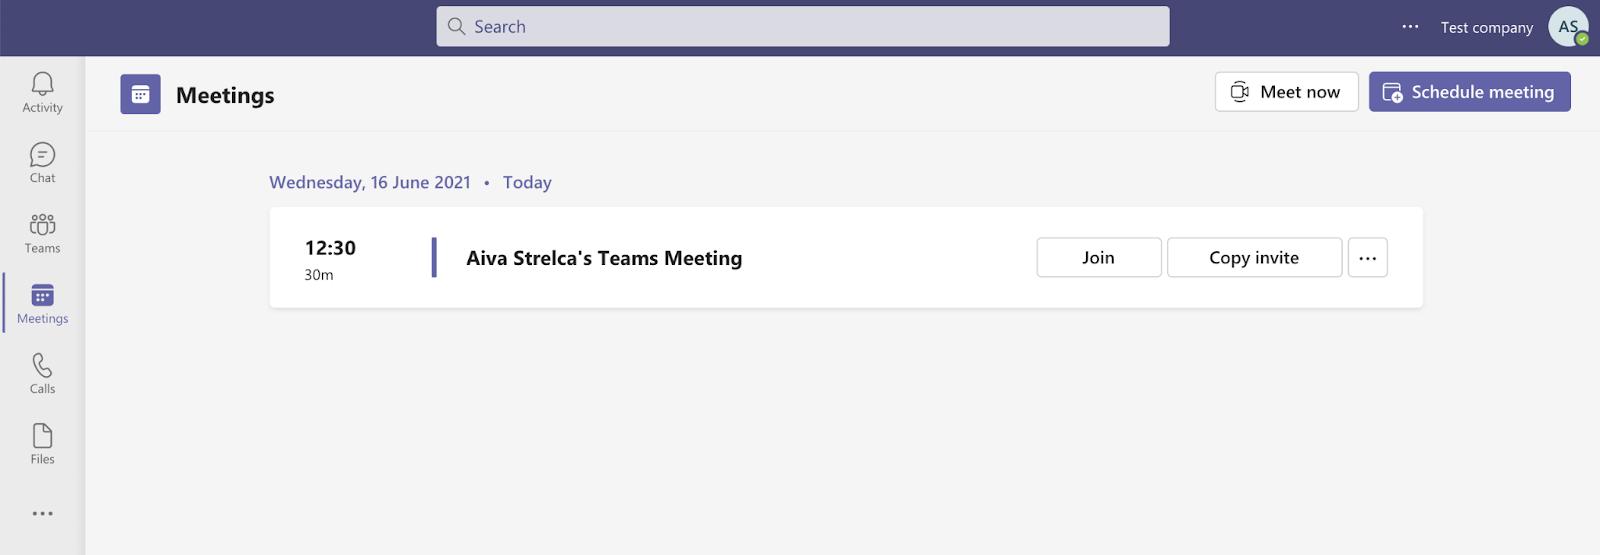 Meetings section on Microsoft Teams